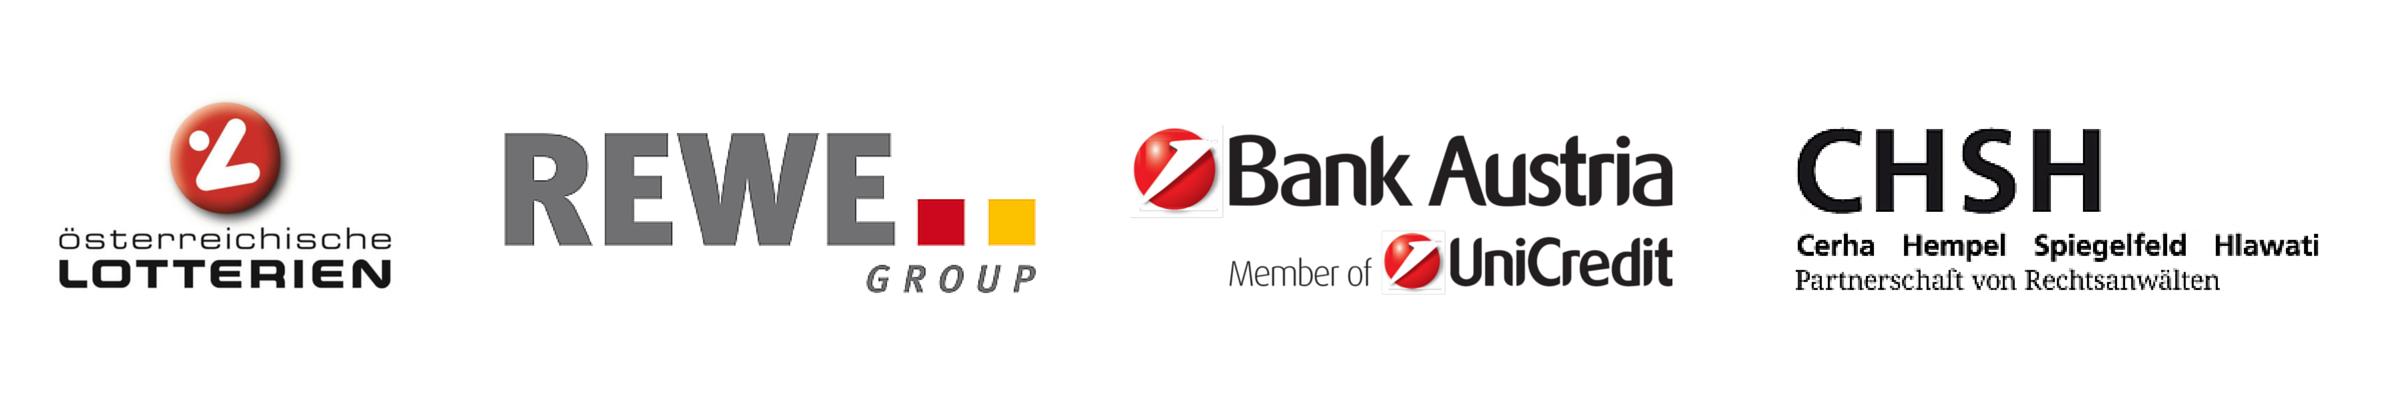 Logos der Partner, Lotterien, BankAustria, Rewe, CHSH